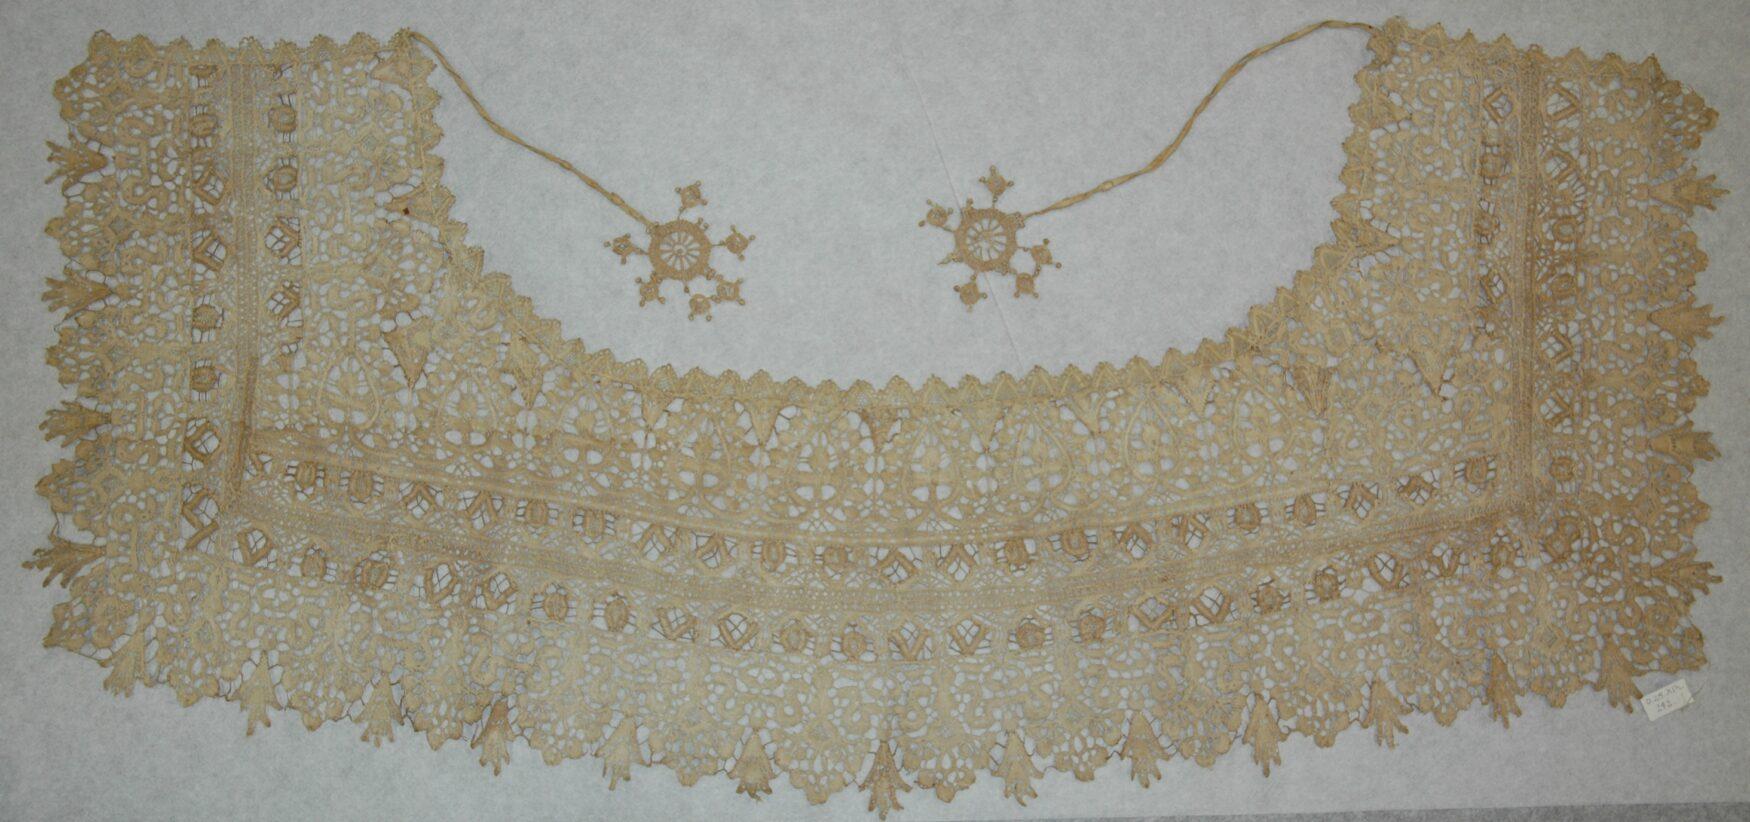 Medici collar, 1st half 17th century